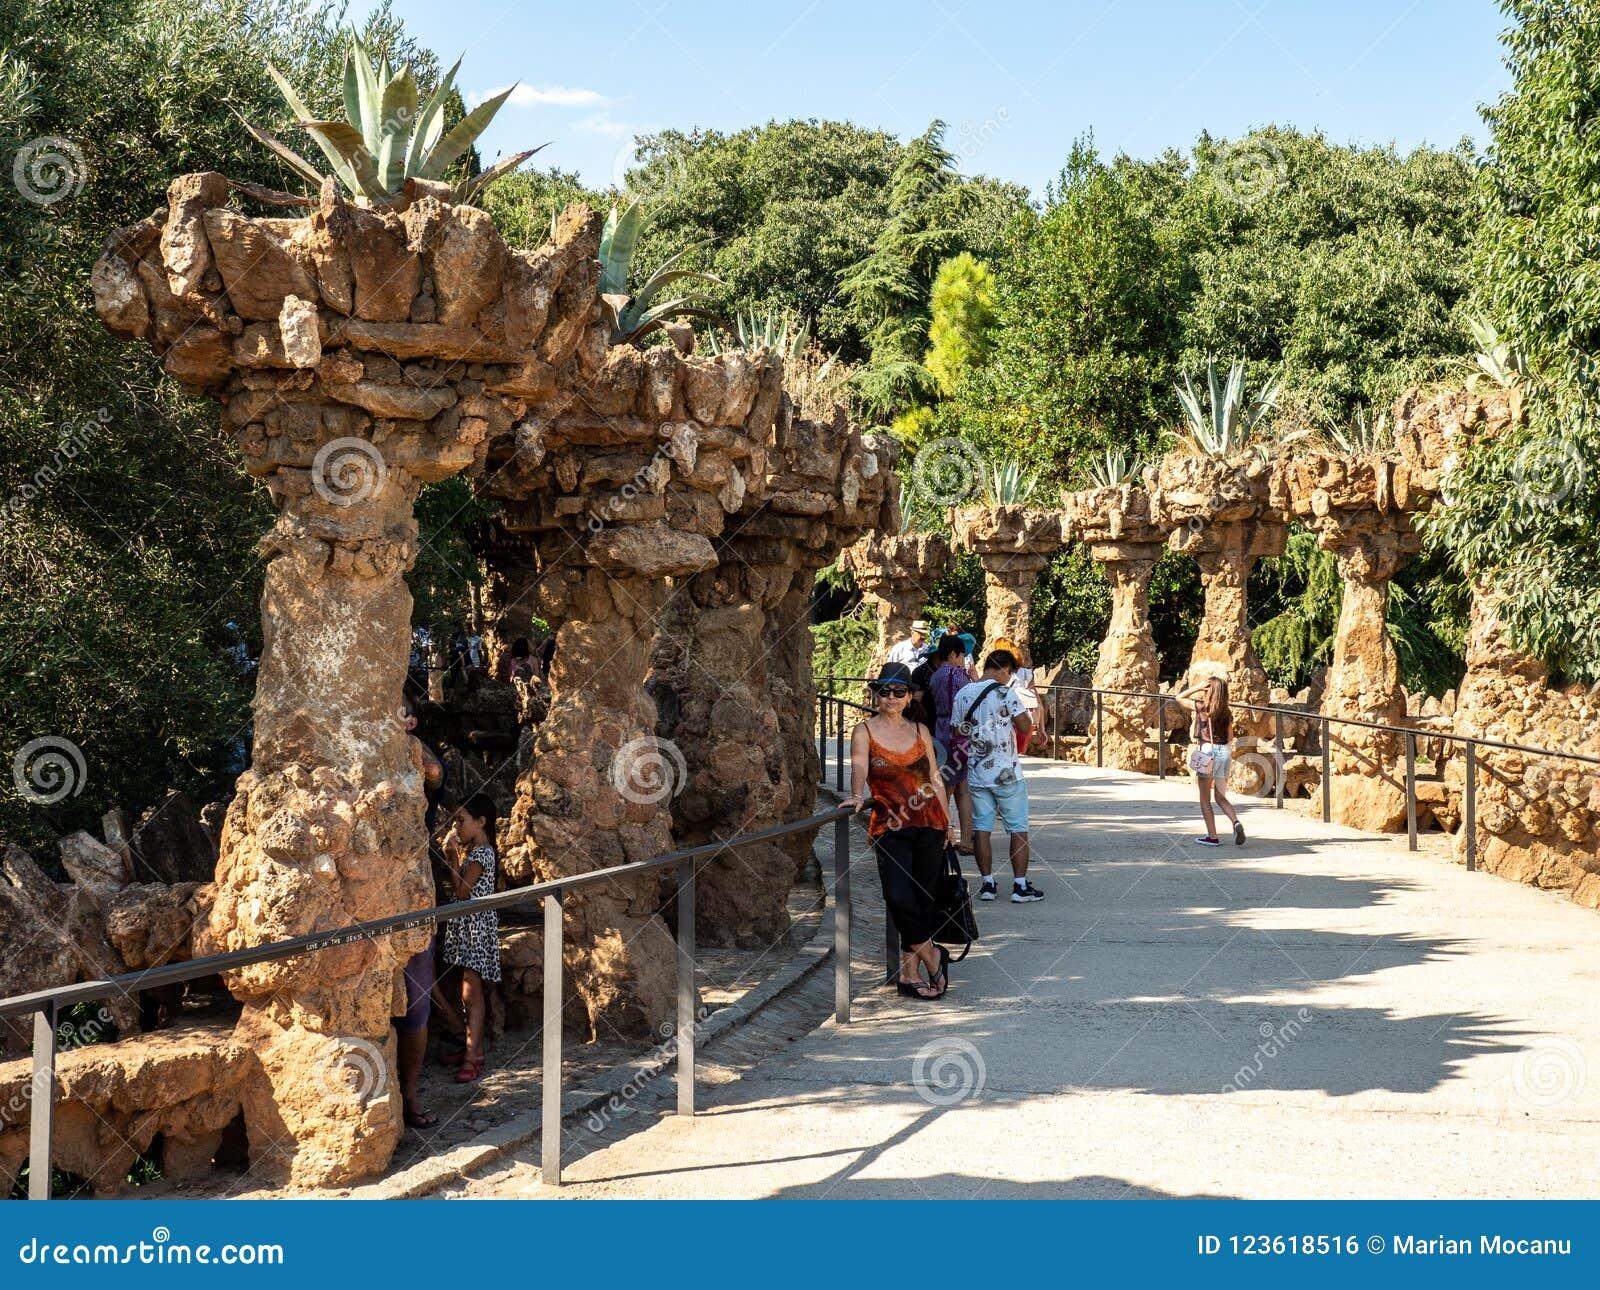 Parc Guell i Barcelona, Spanien, arkitekt Antoni Gaudi